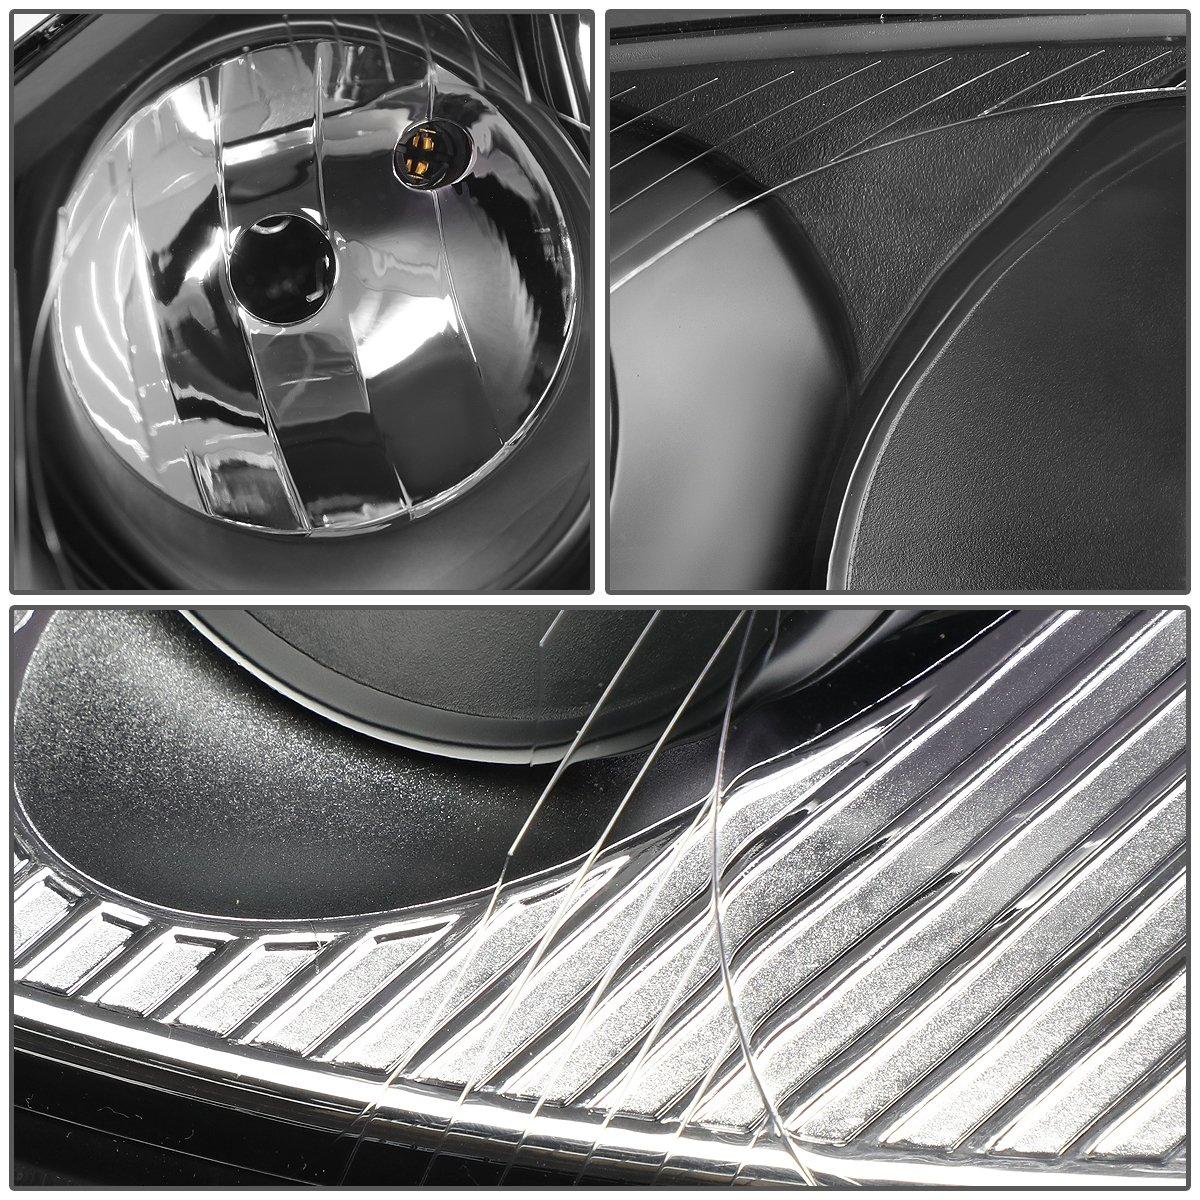 VW Golf / GTI / Jetta / Rabbit Pair of Headlight (Black Housing Clear Corner) by Auto Dynasty (Image #3)